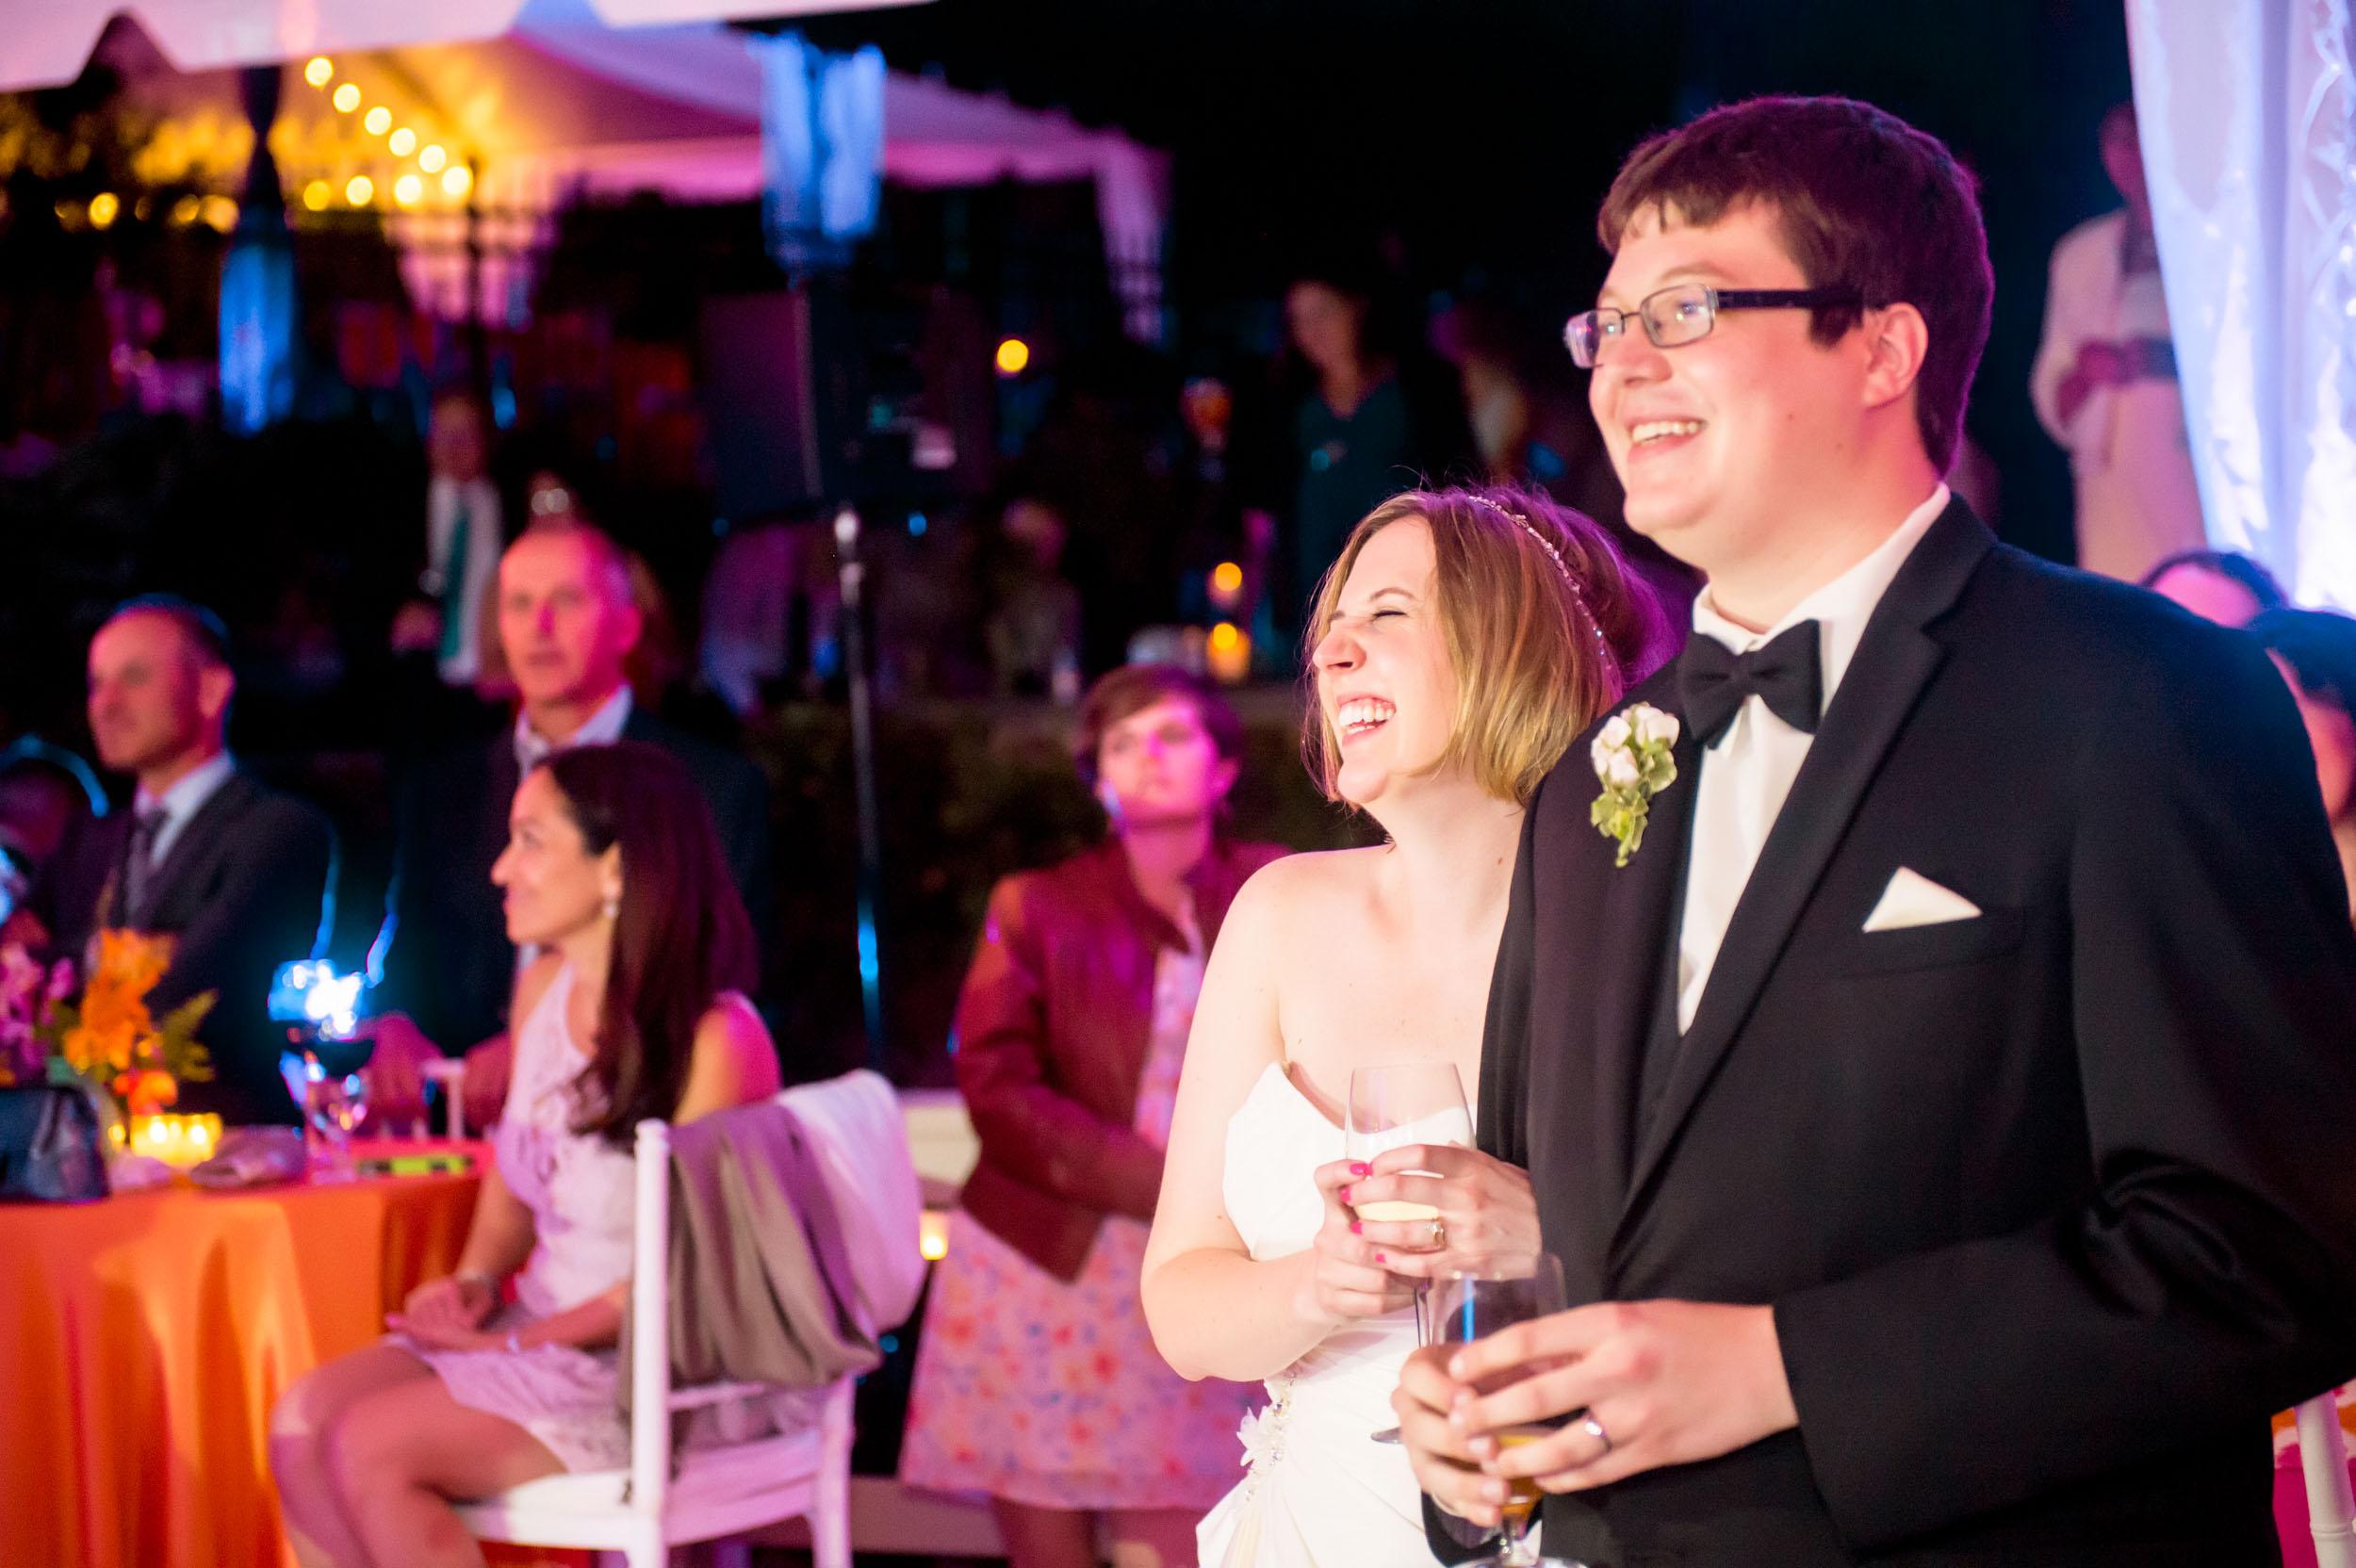 Wedding96KateTim 585*2-Edit-2.jpg